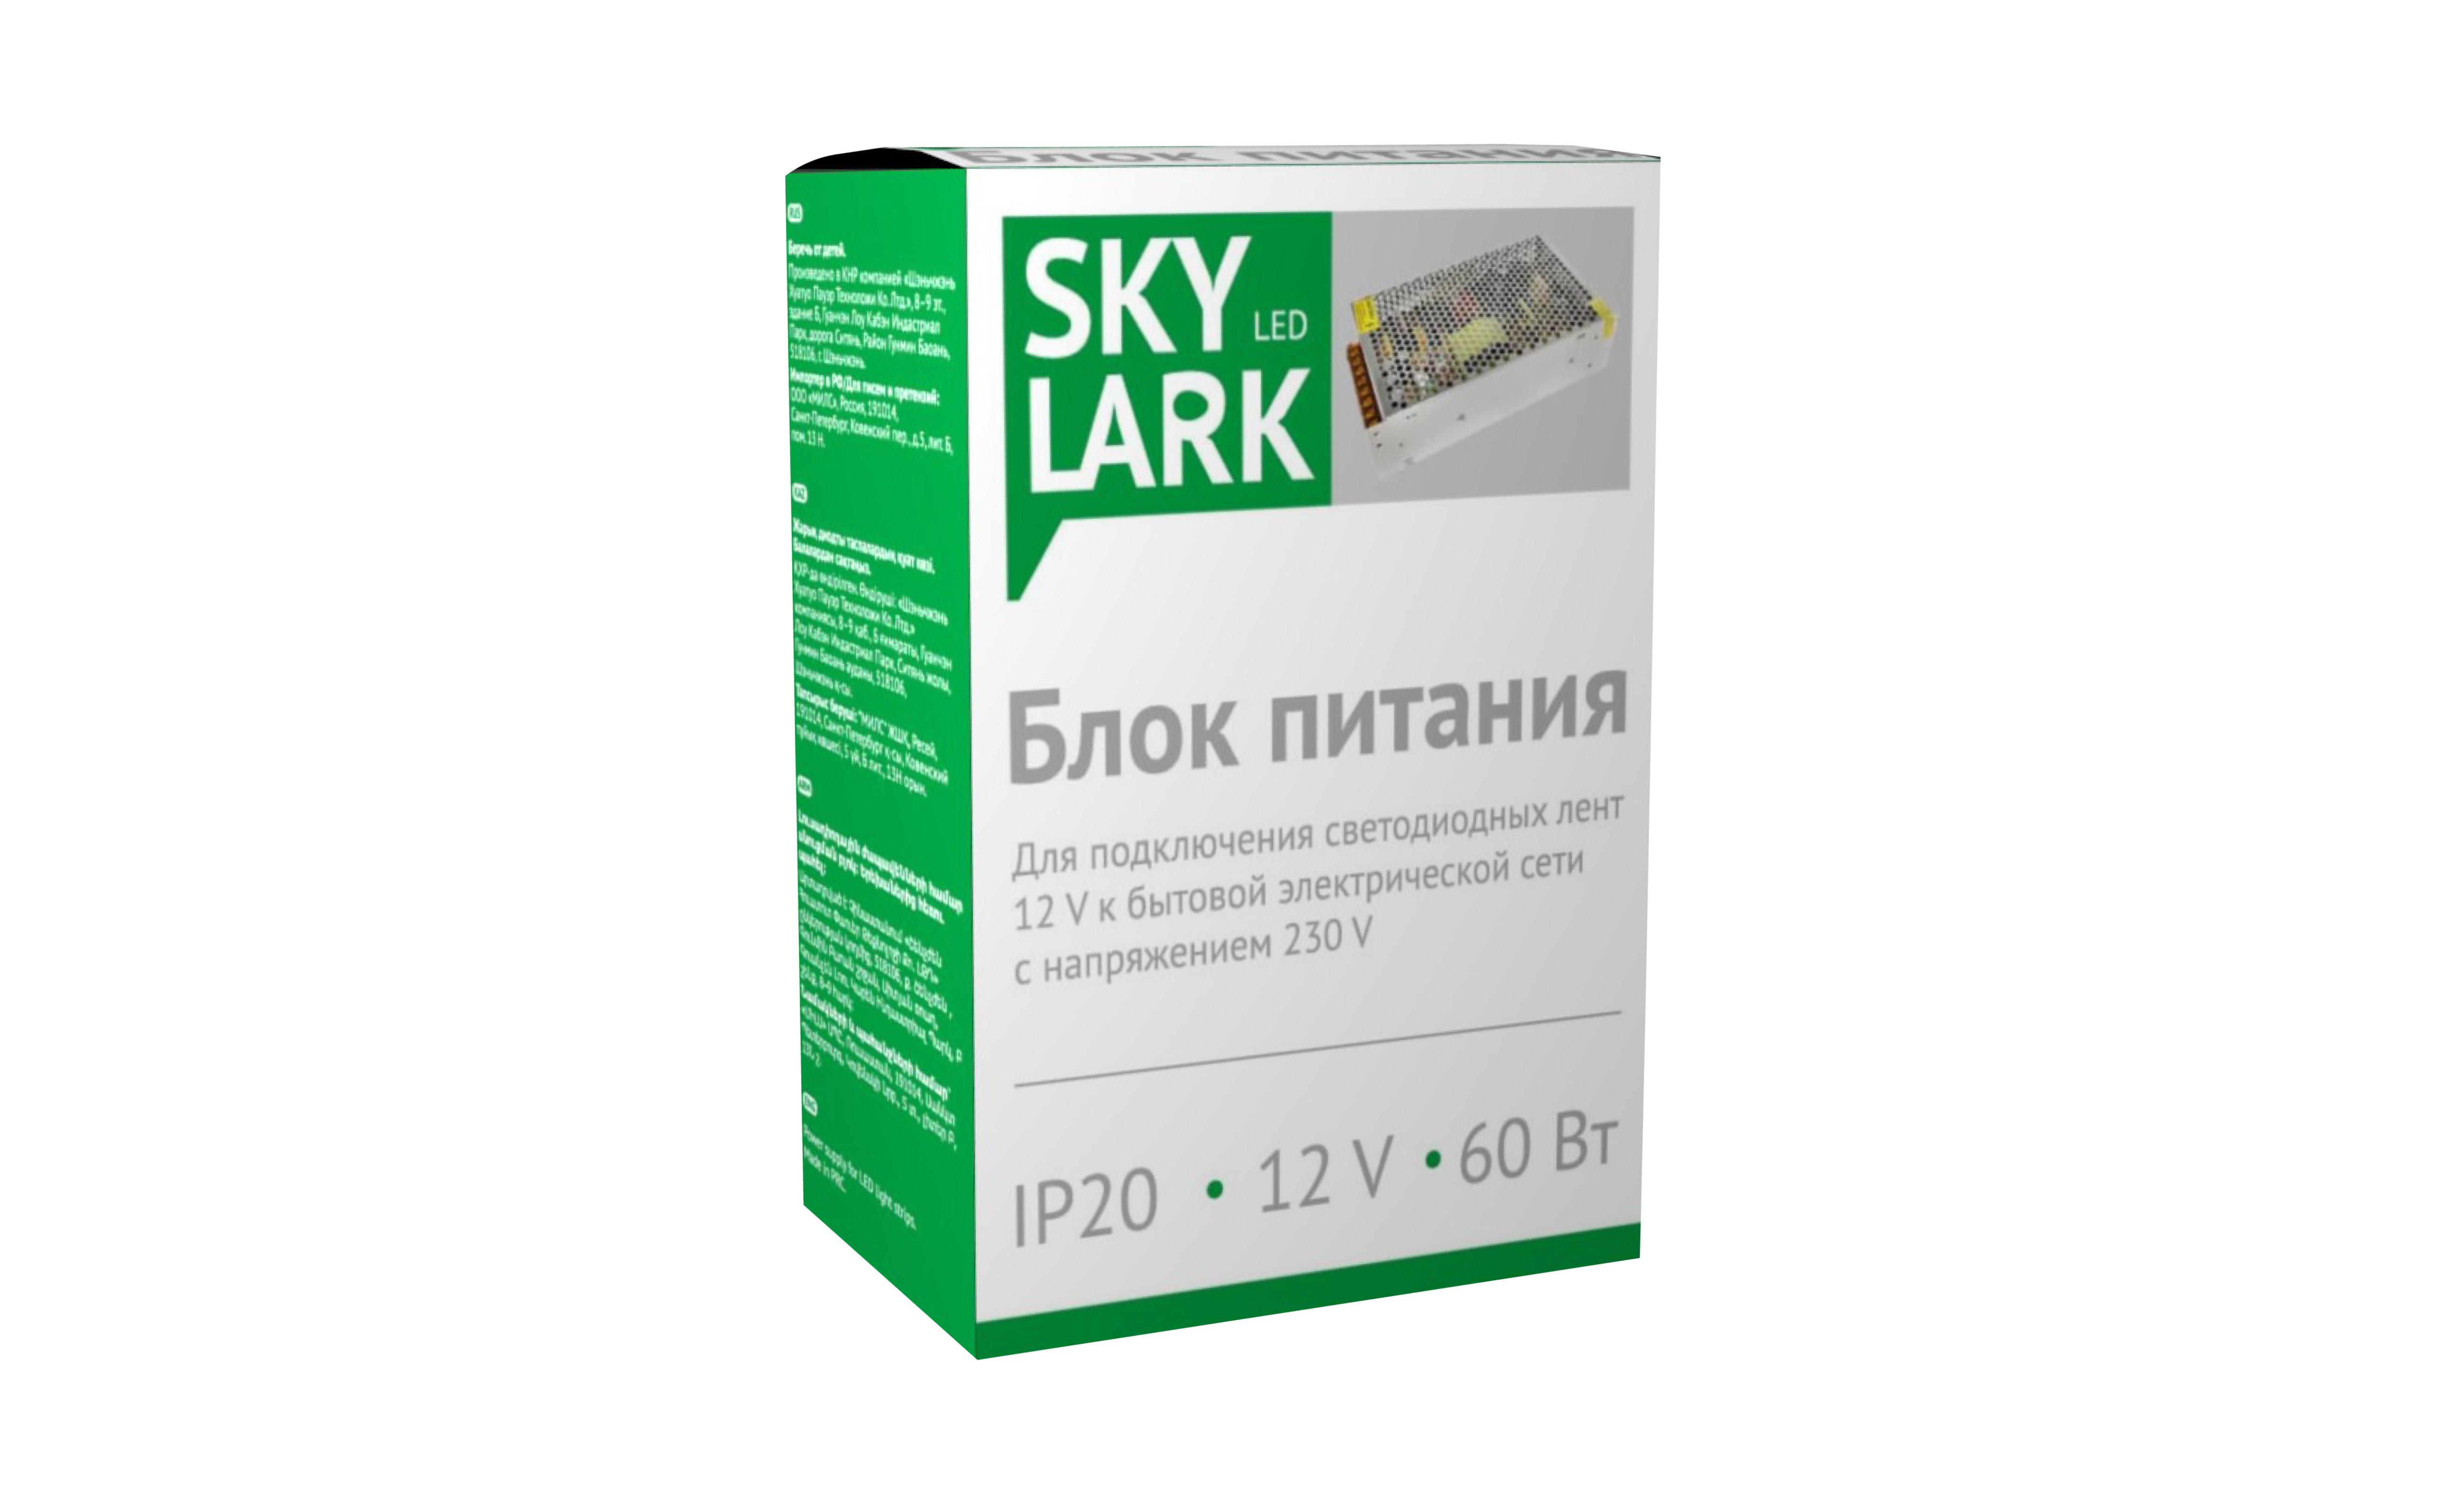 Блок питания Skylark S025